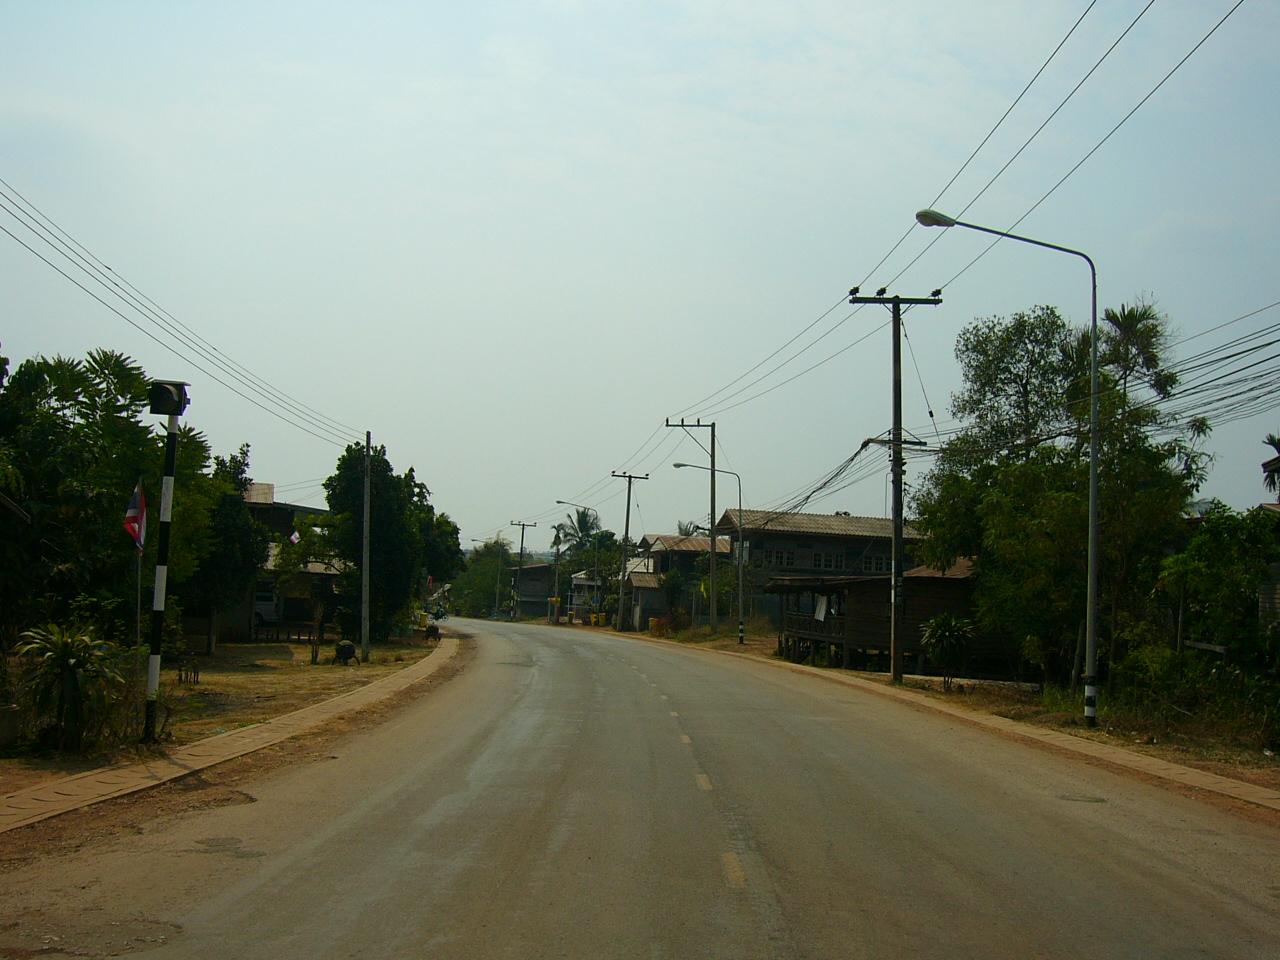 File:Rural street-Isan.JPG - Wikimedia Commons